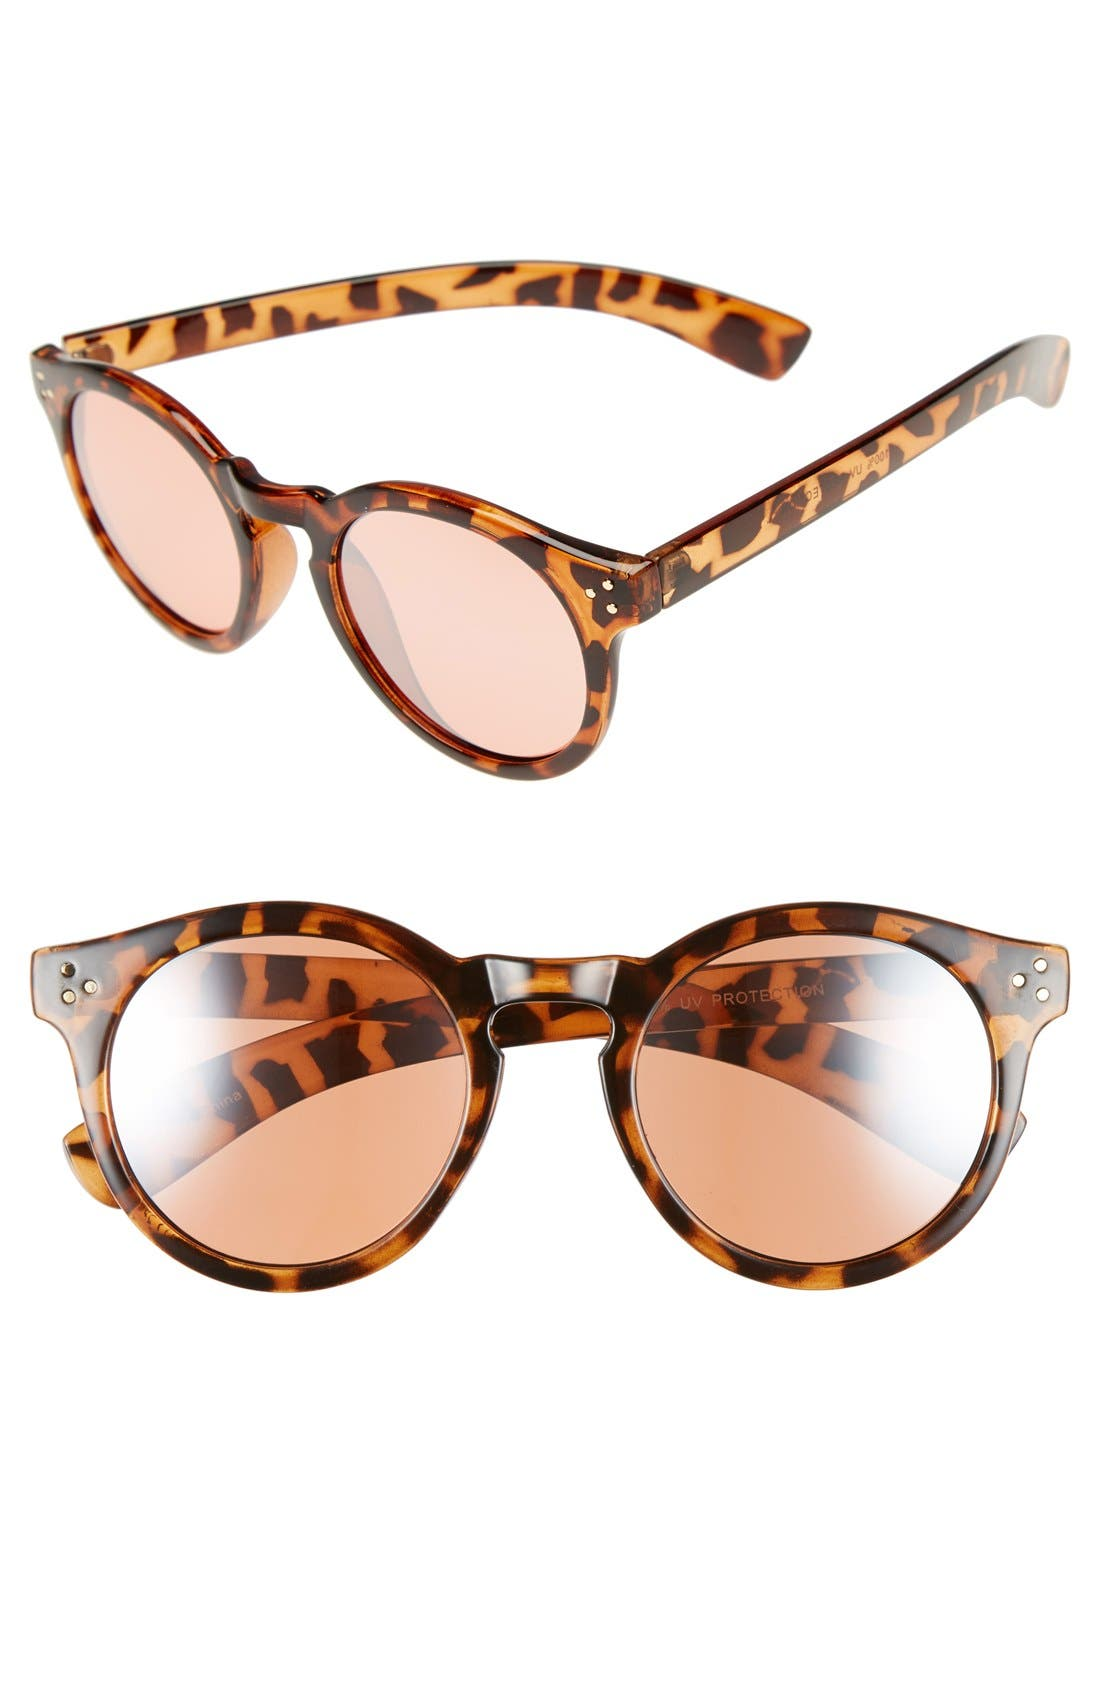 50mm Mirrored Round Sunglasses, Main, color, 040